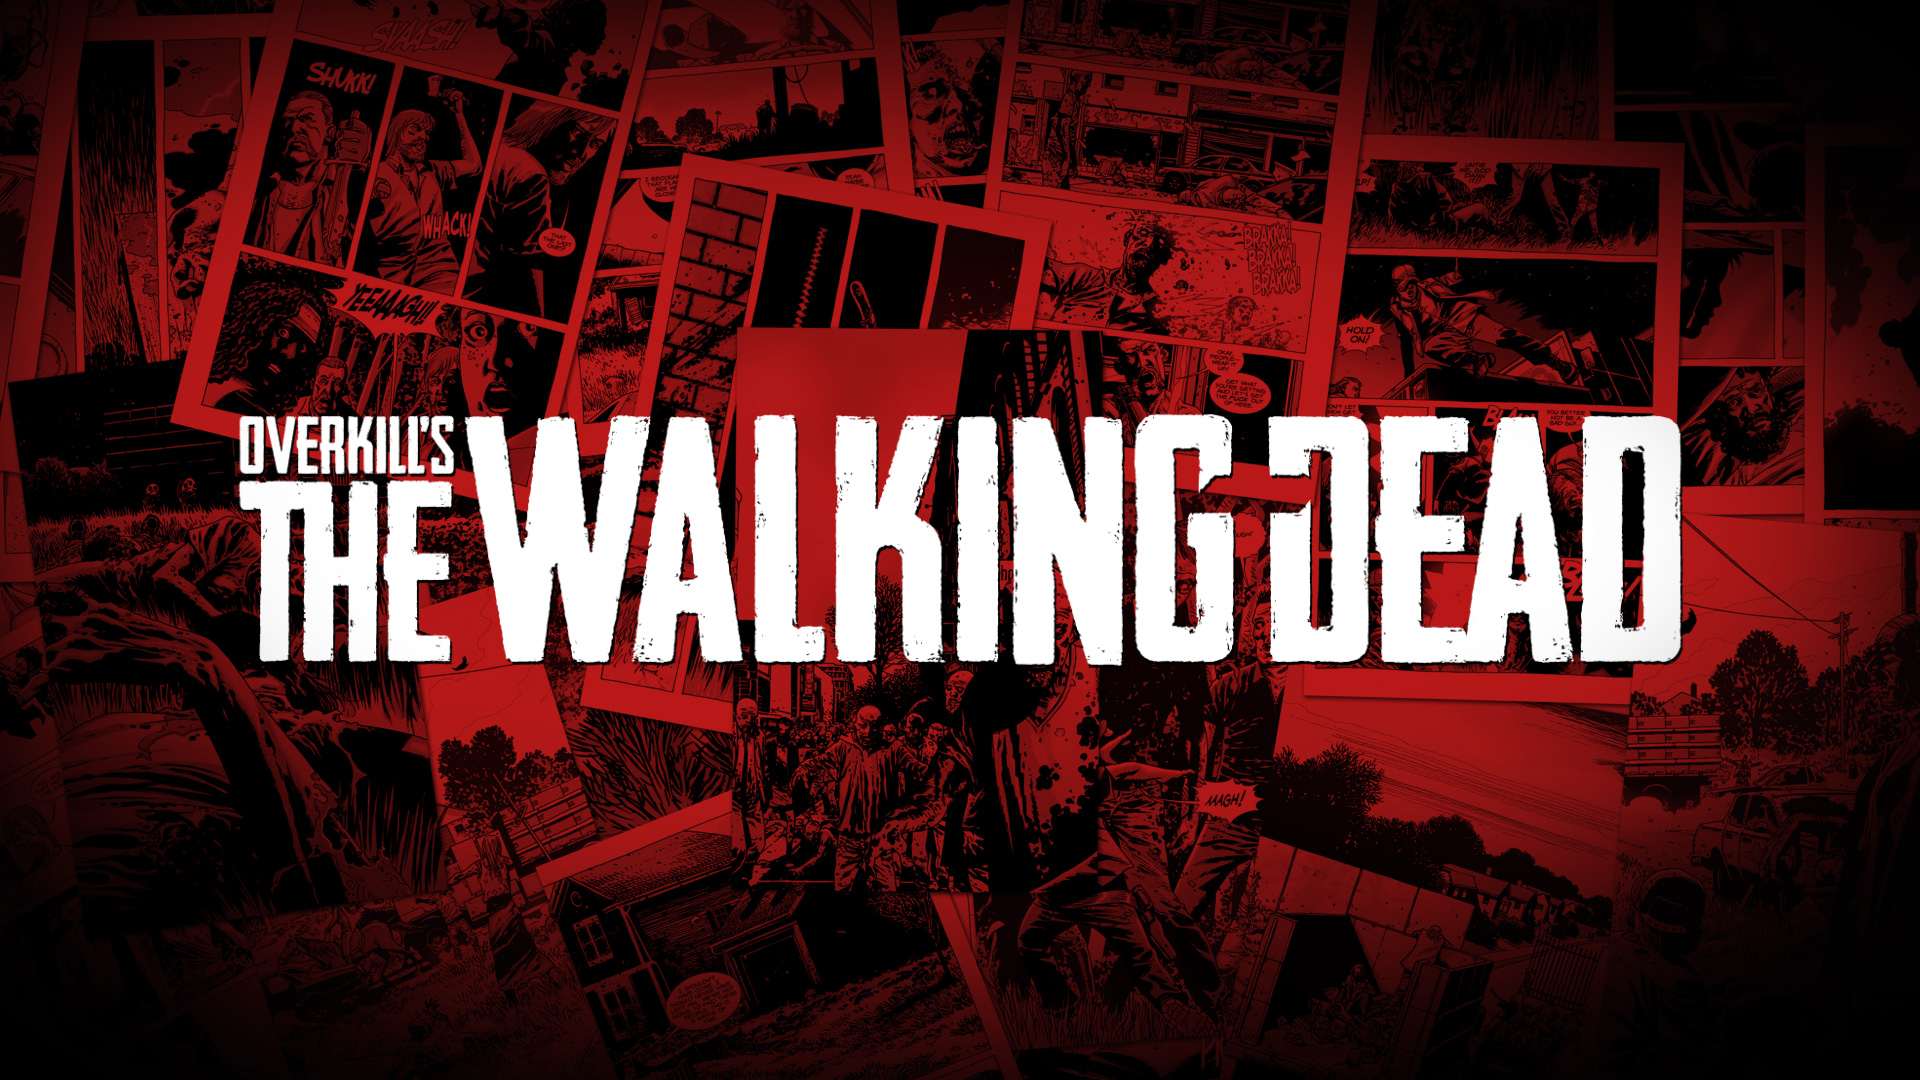 The Walking Dead da Overkill ainda mexe